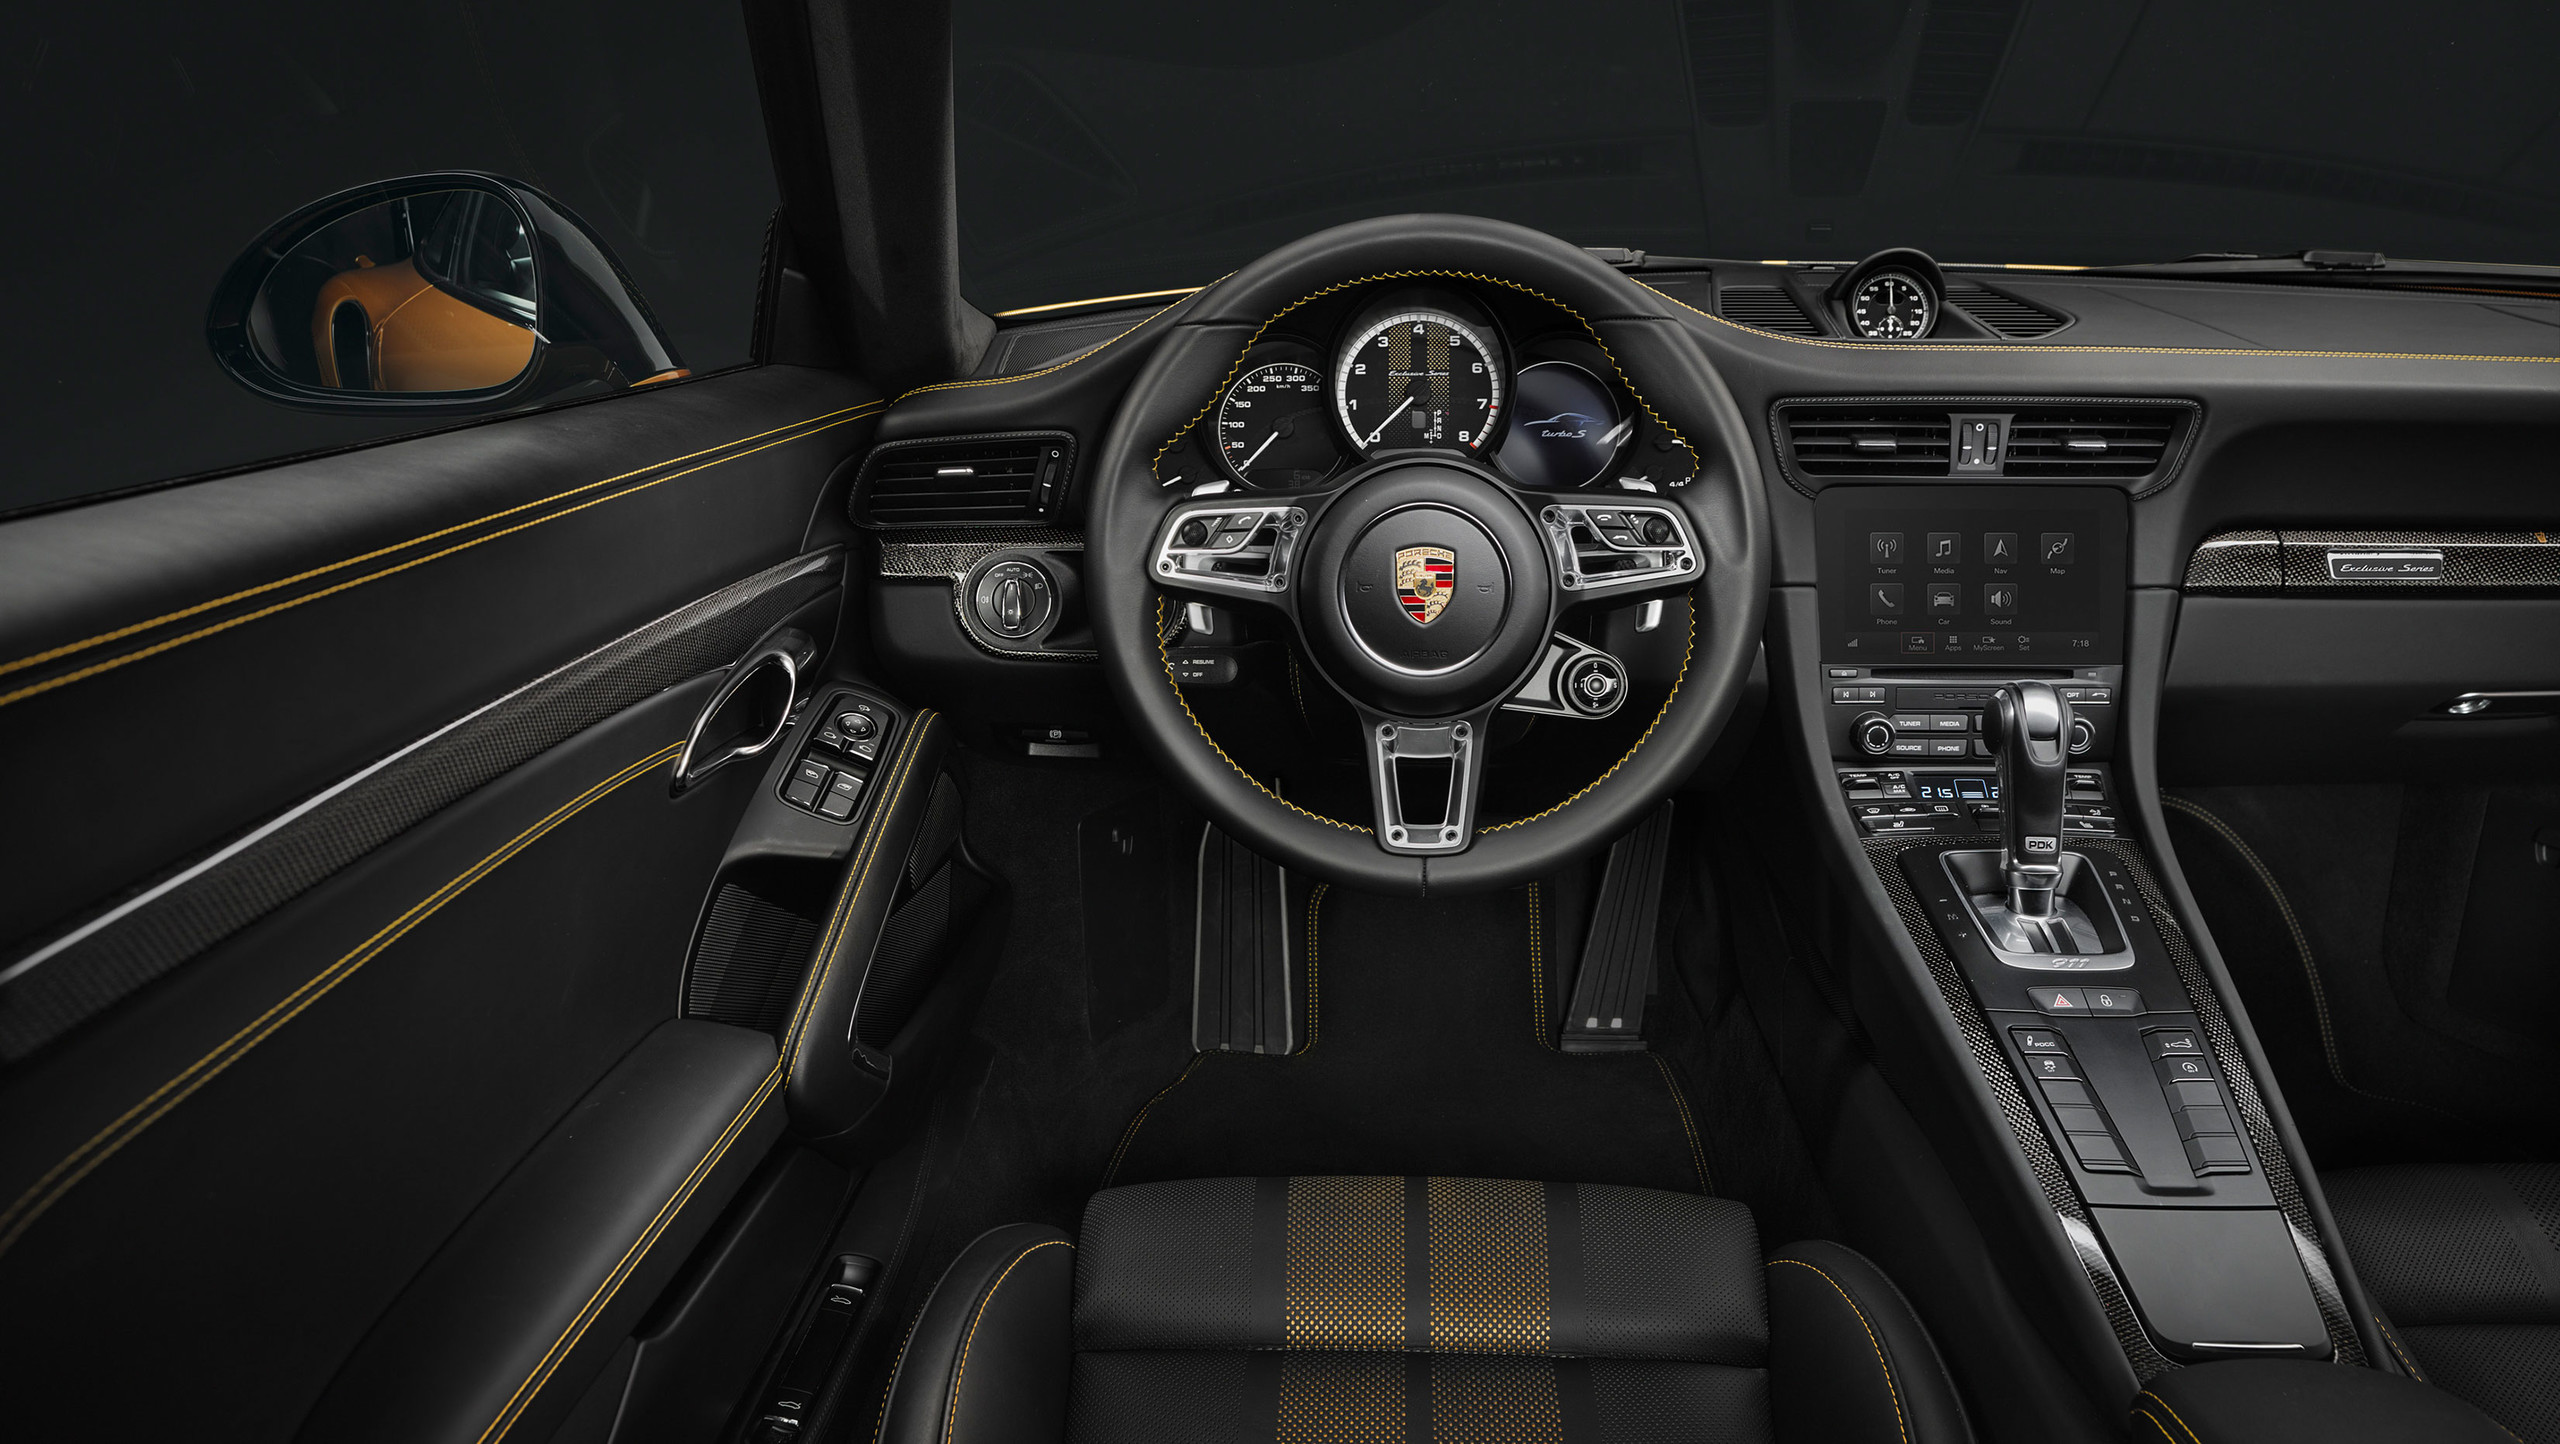 Foto de Porsche 911 Turbo S Exclusive Series (12/12)